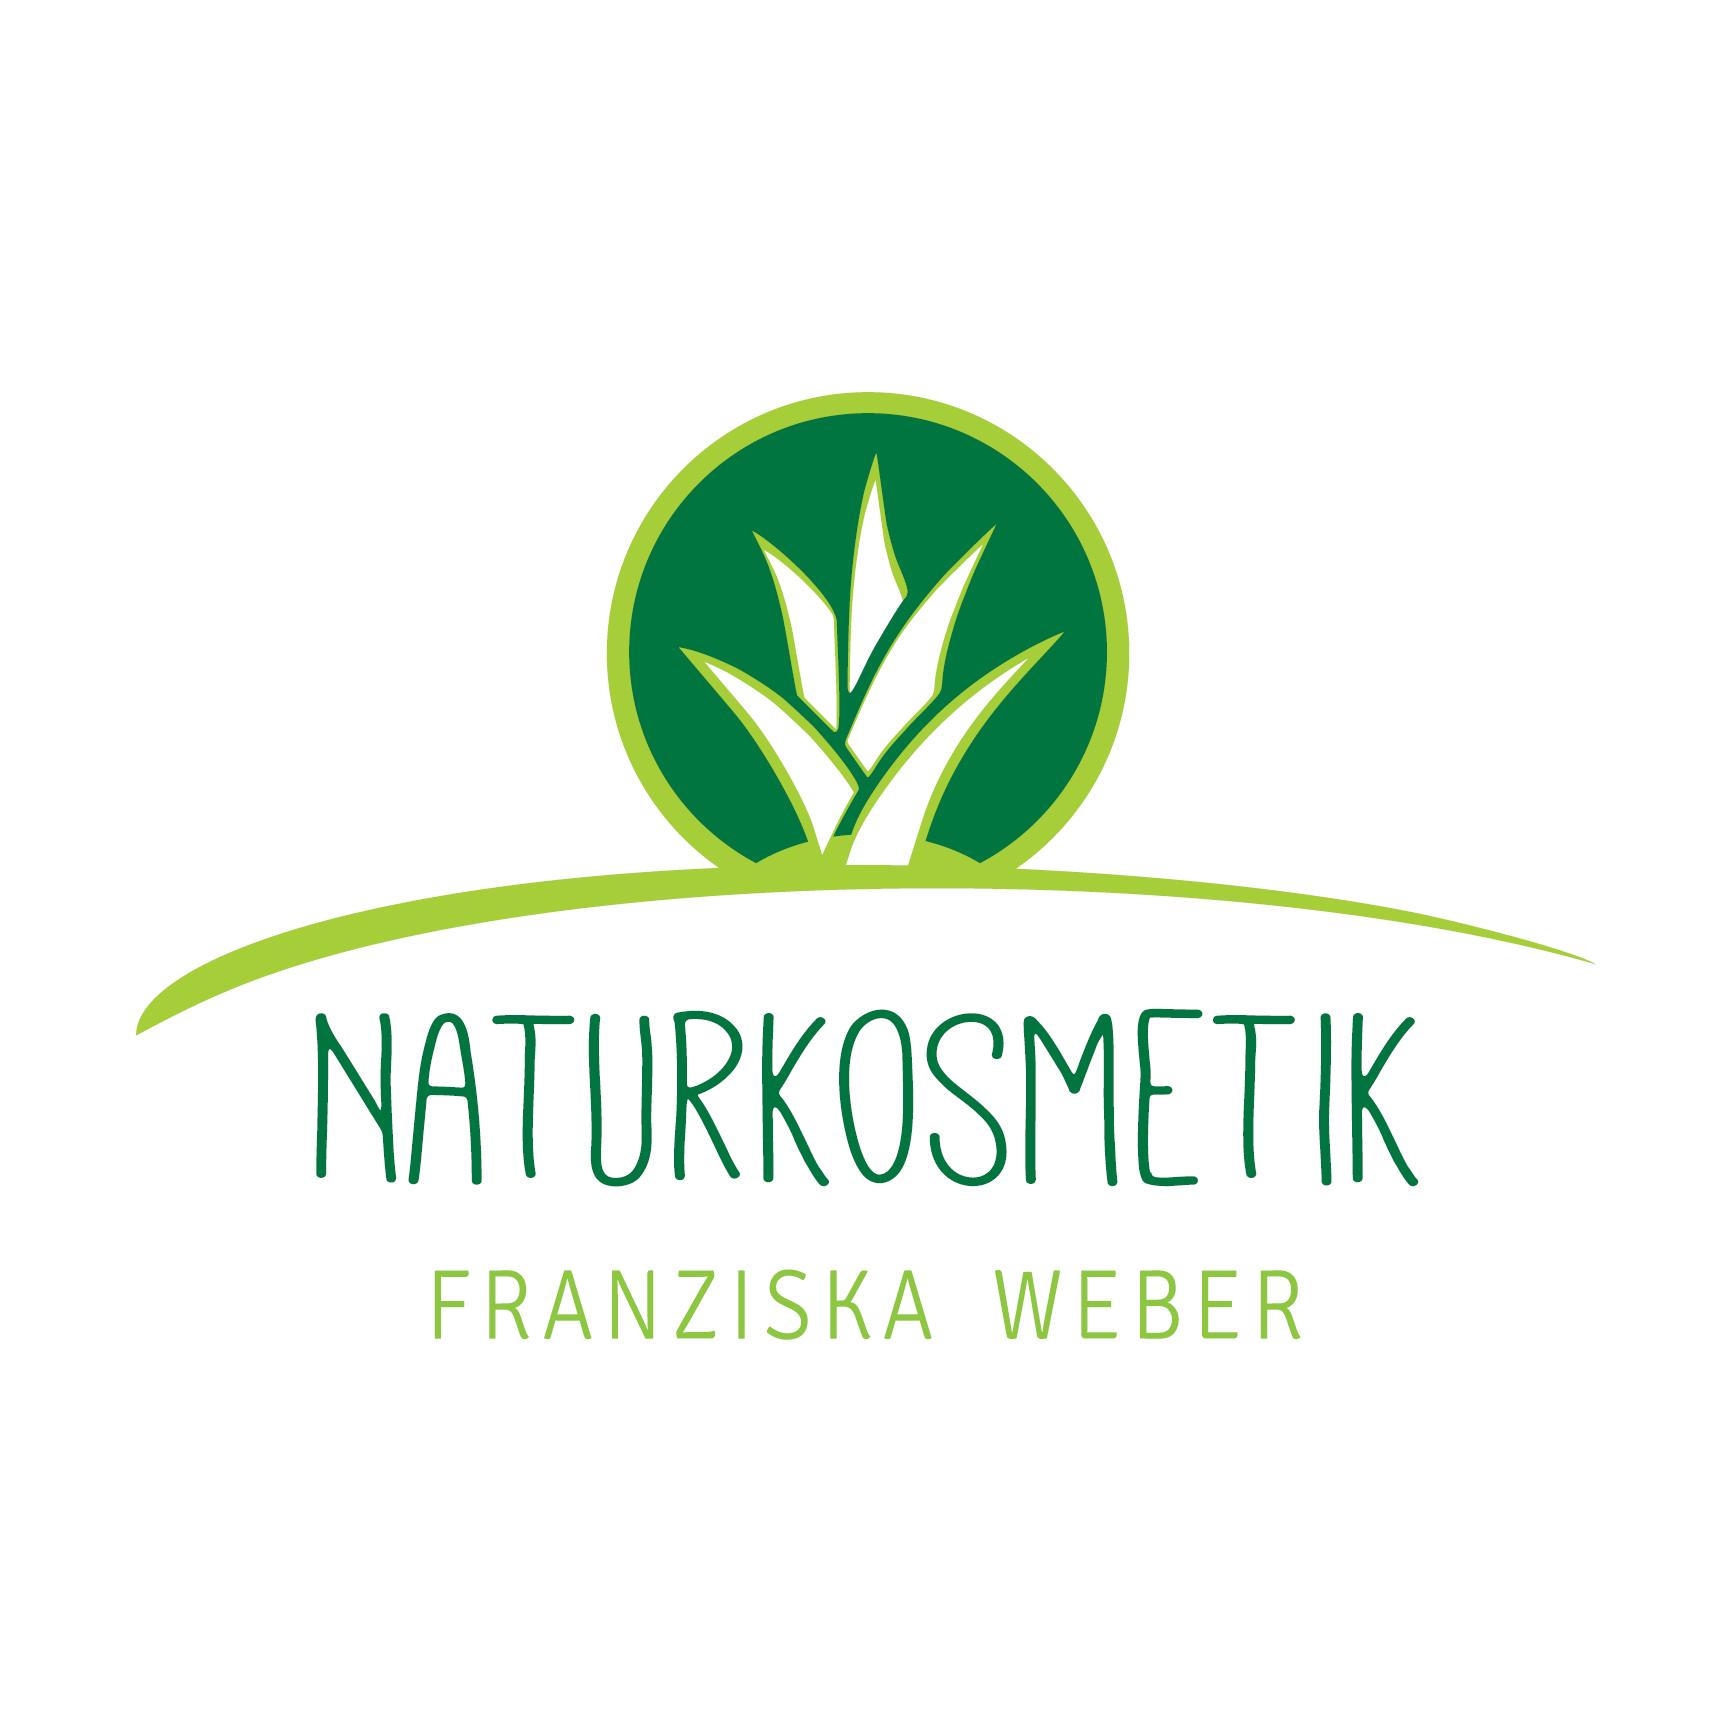 Naturkosmetik Franziska Weber